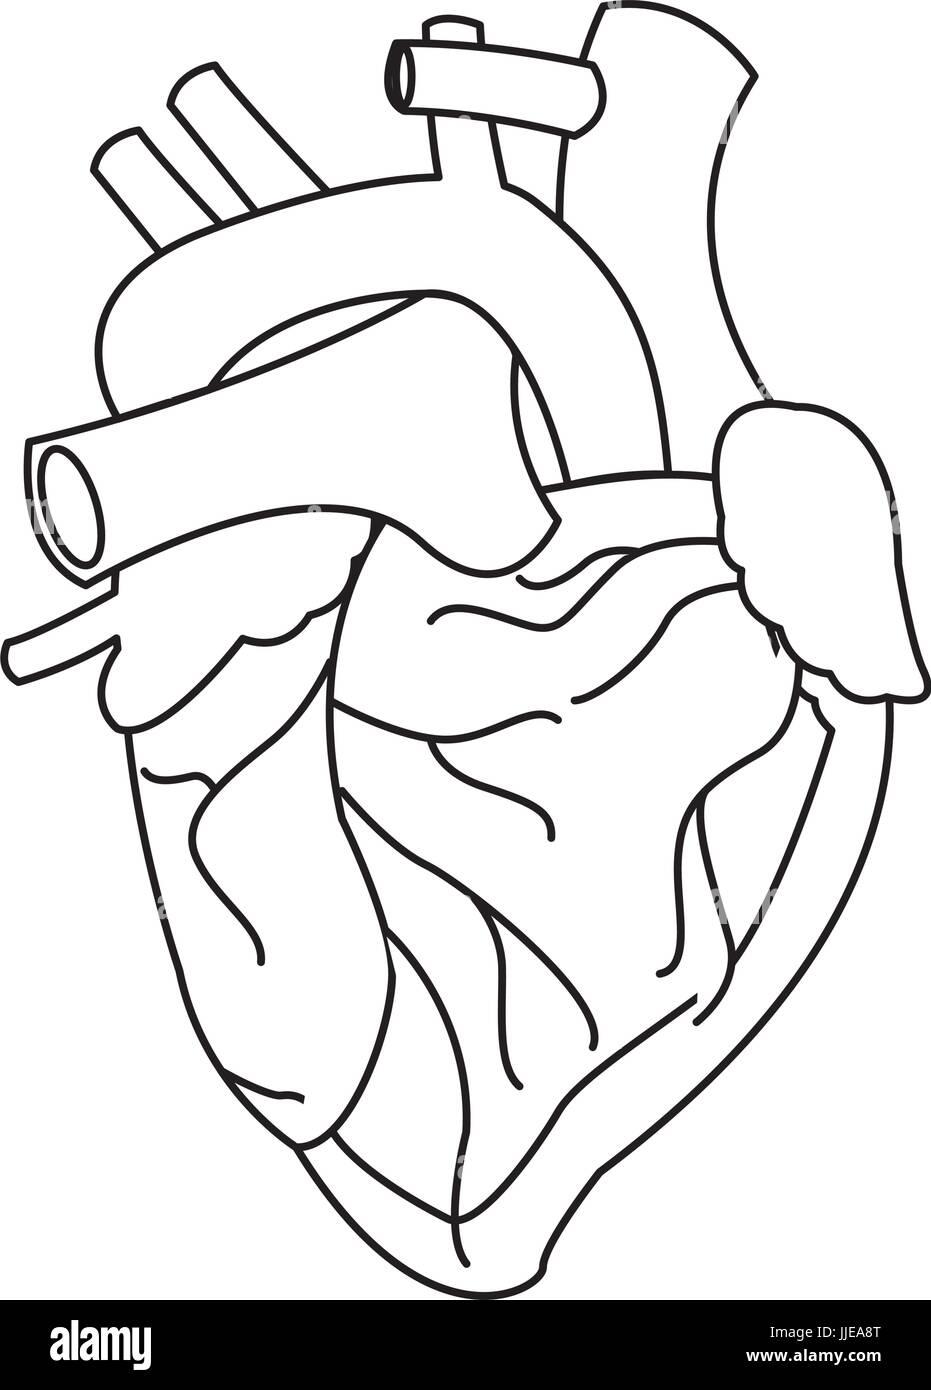 human heart medical anatomical artery - Stock Image